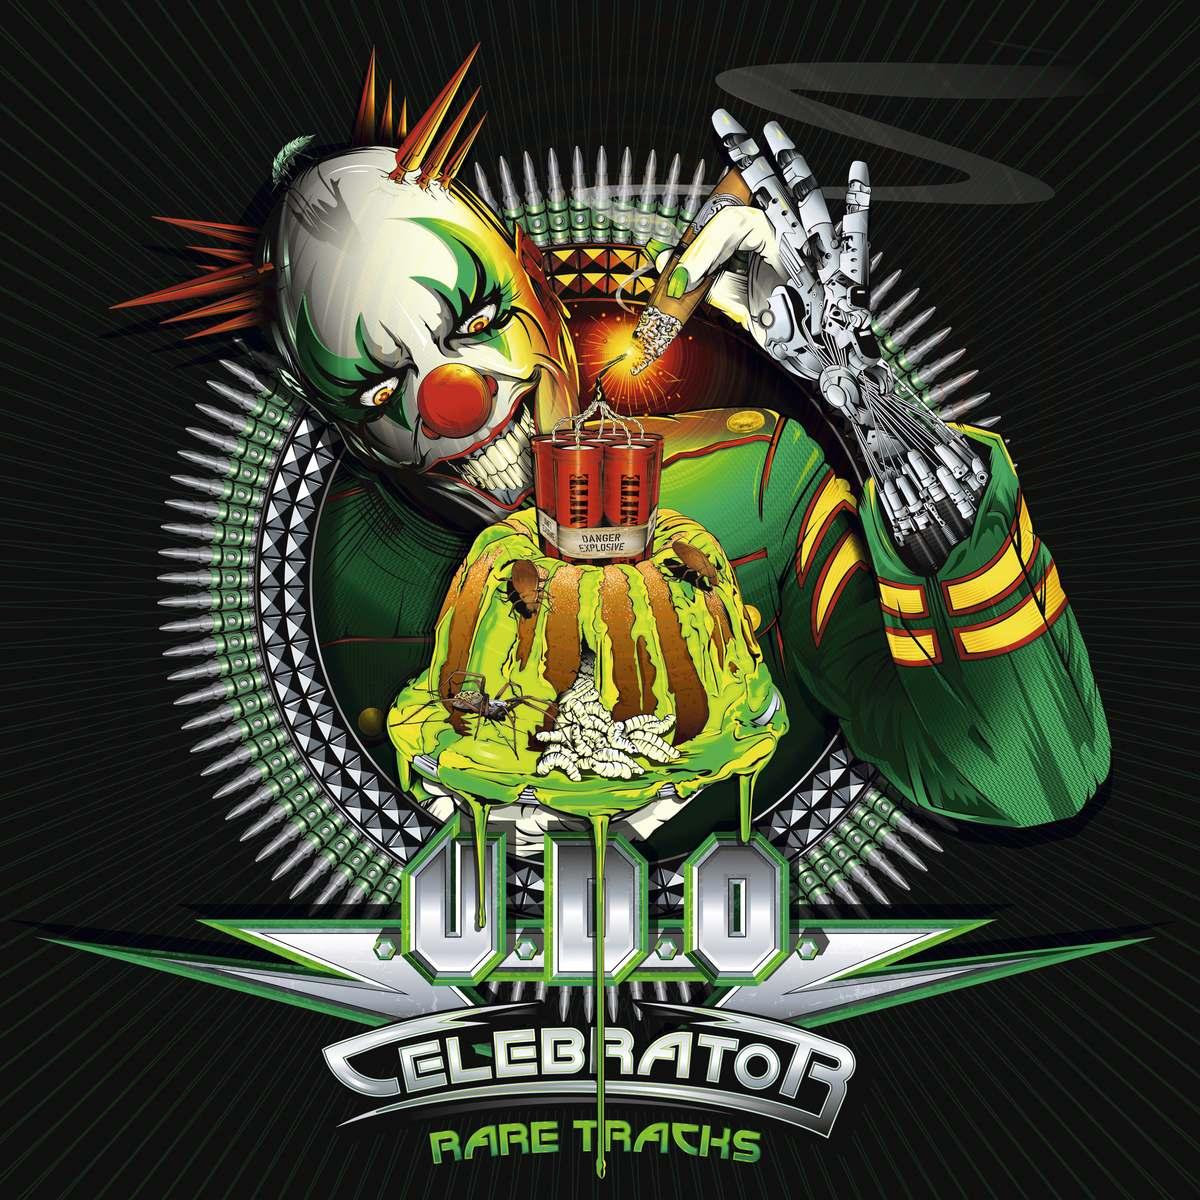 HammerFall / U.D.O. / Raven / Lordi - U.D.O.: Celebrator (Rare Tracks)